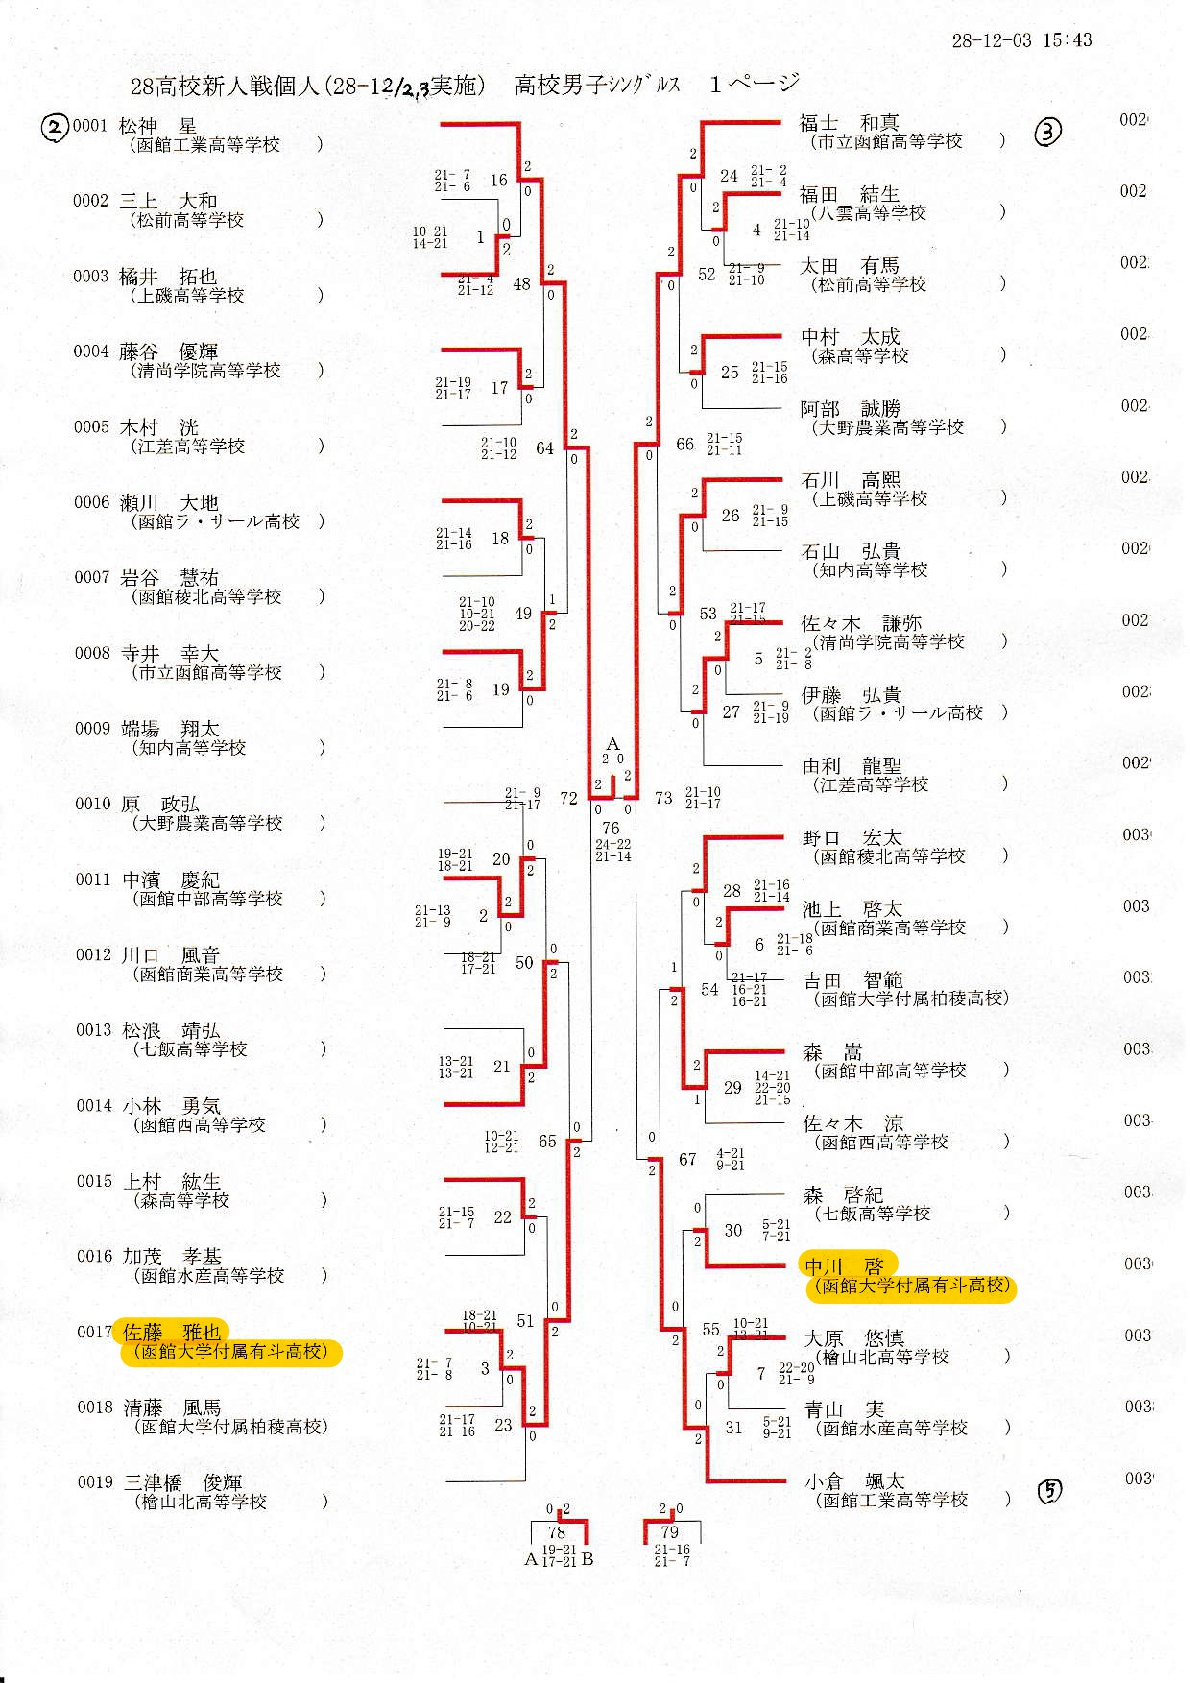 h28-koukou-sinzinsen-kekka-split-merge-006.jpg